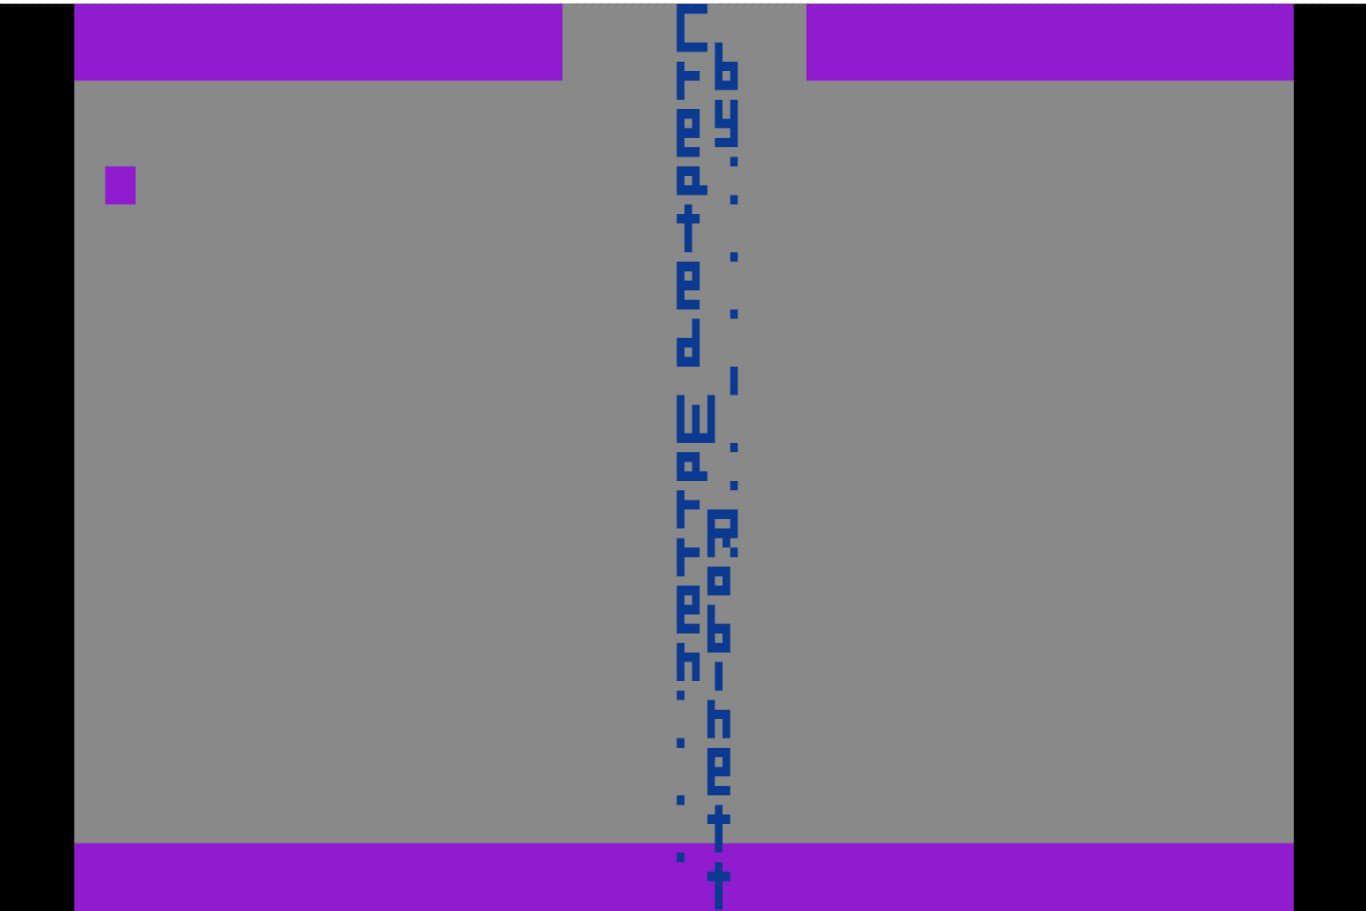 The secret Easter egg in Adventure for the Atari 2600